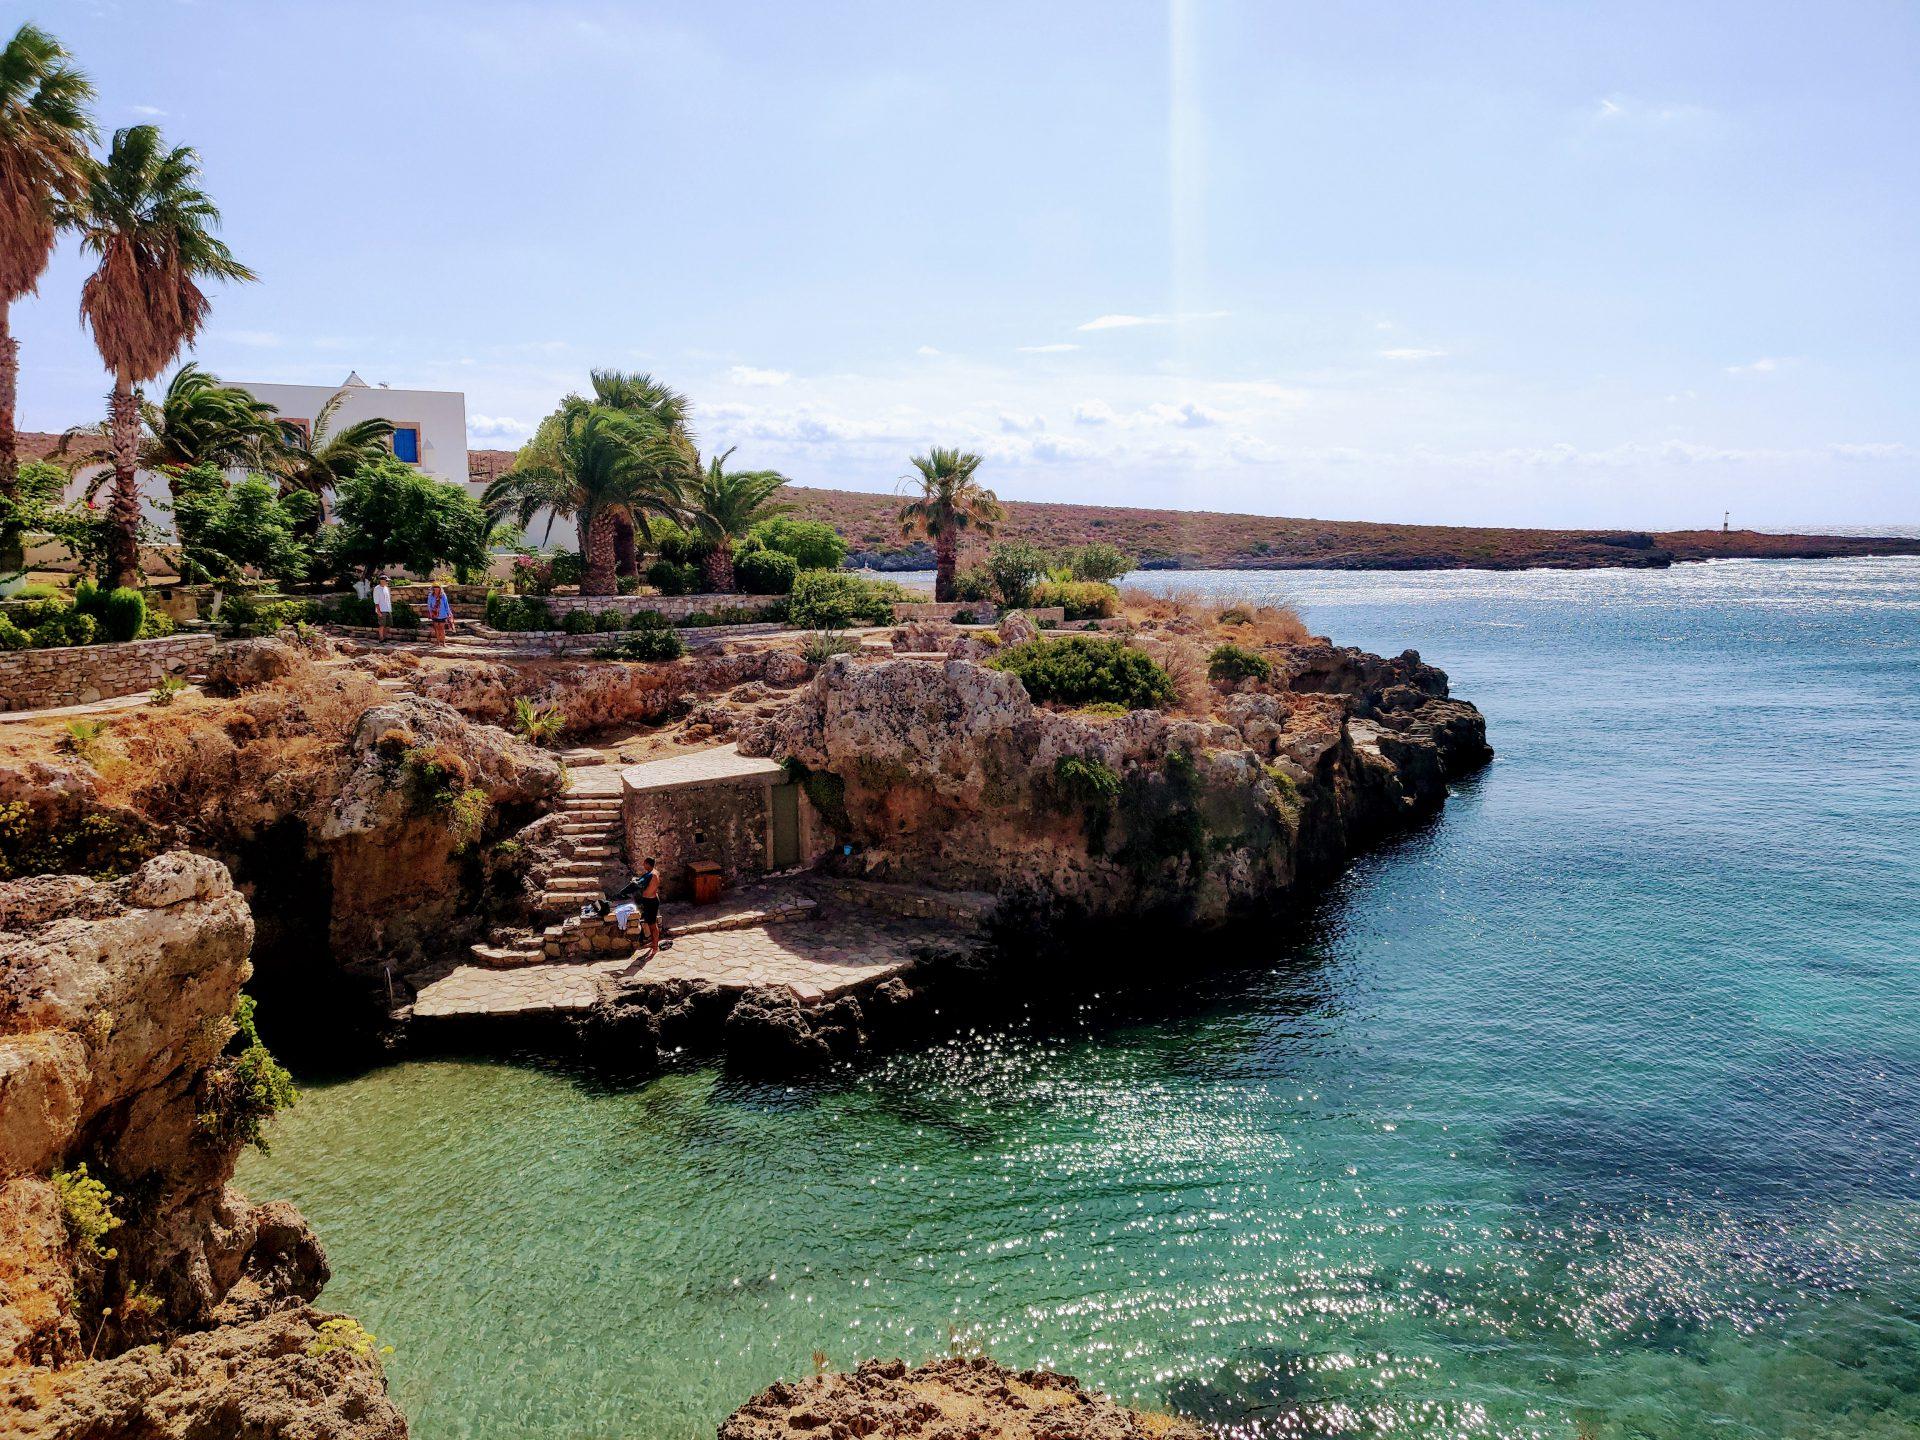 Kythira - Griekenland - onbekend Europa - Reisblog